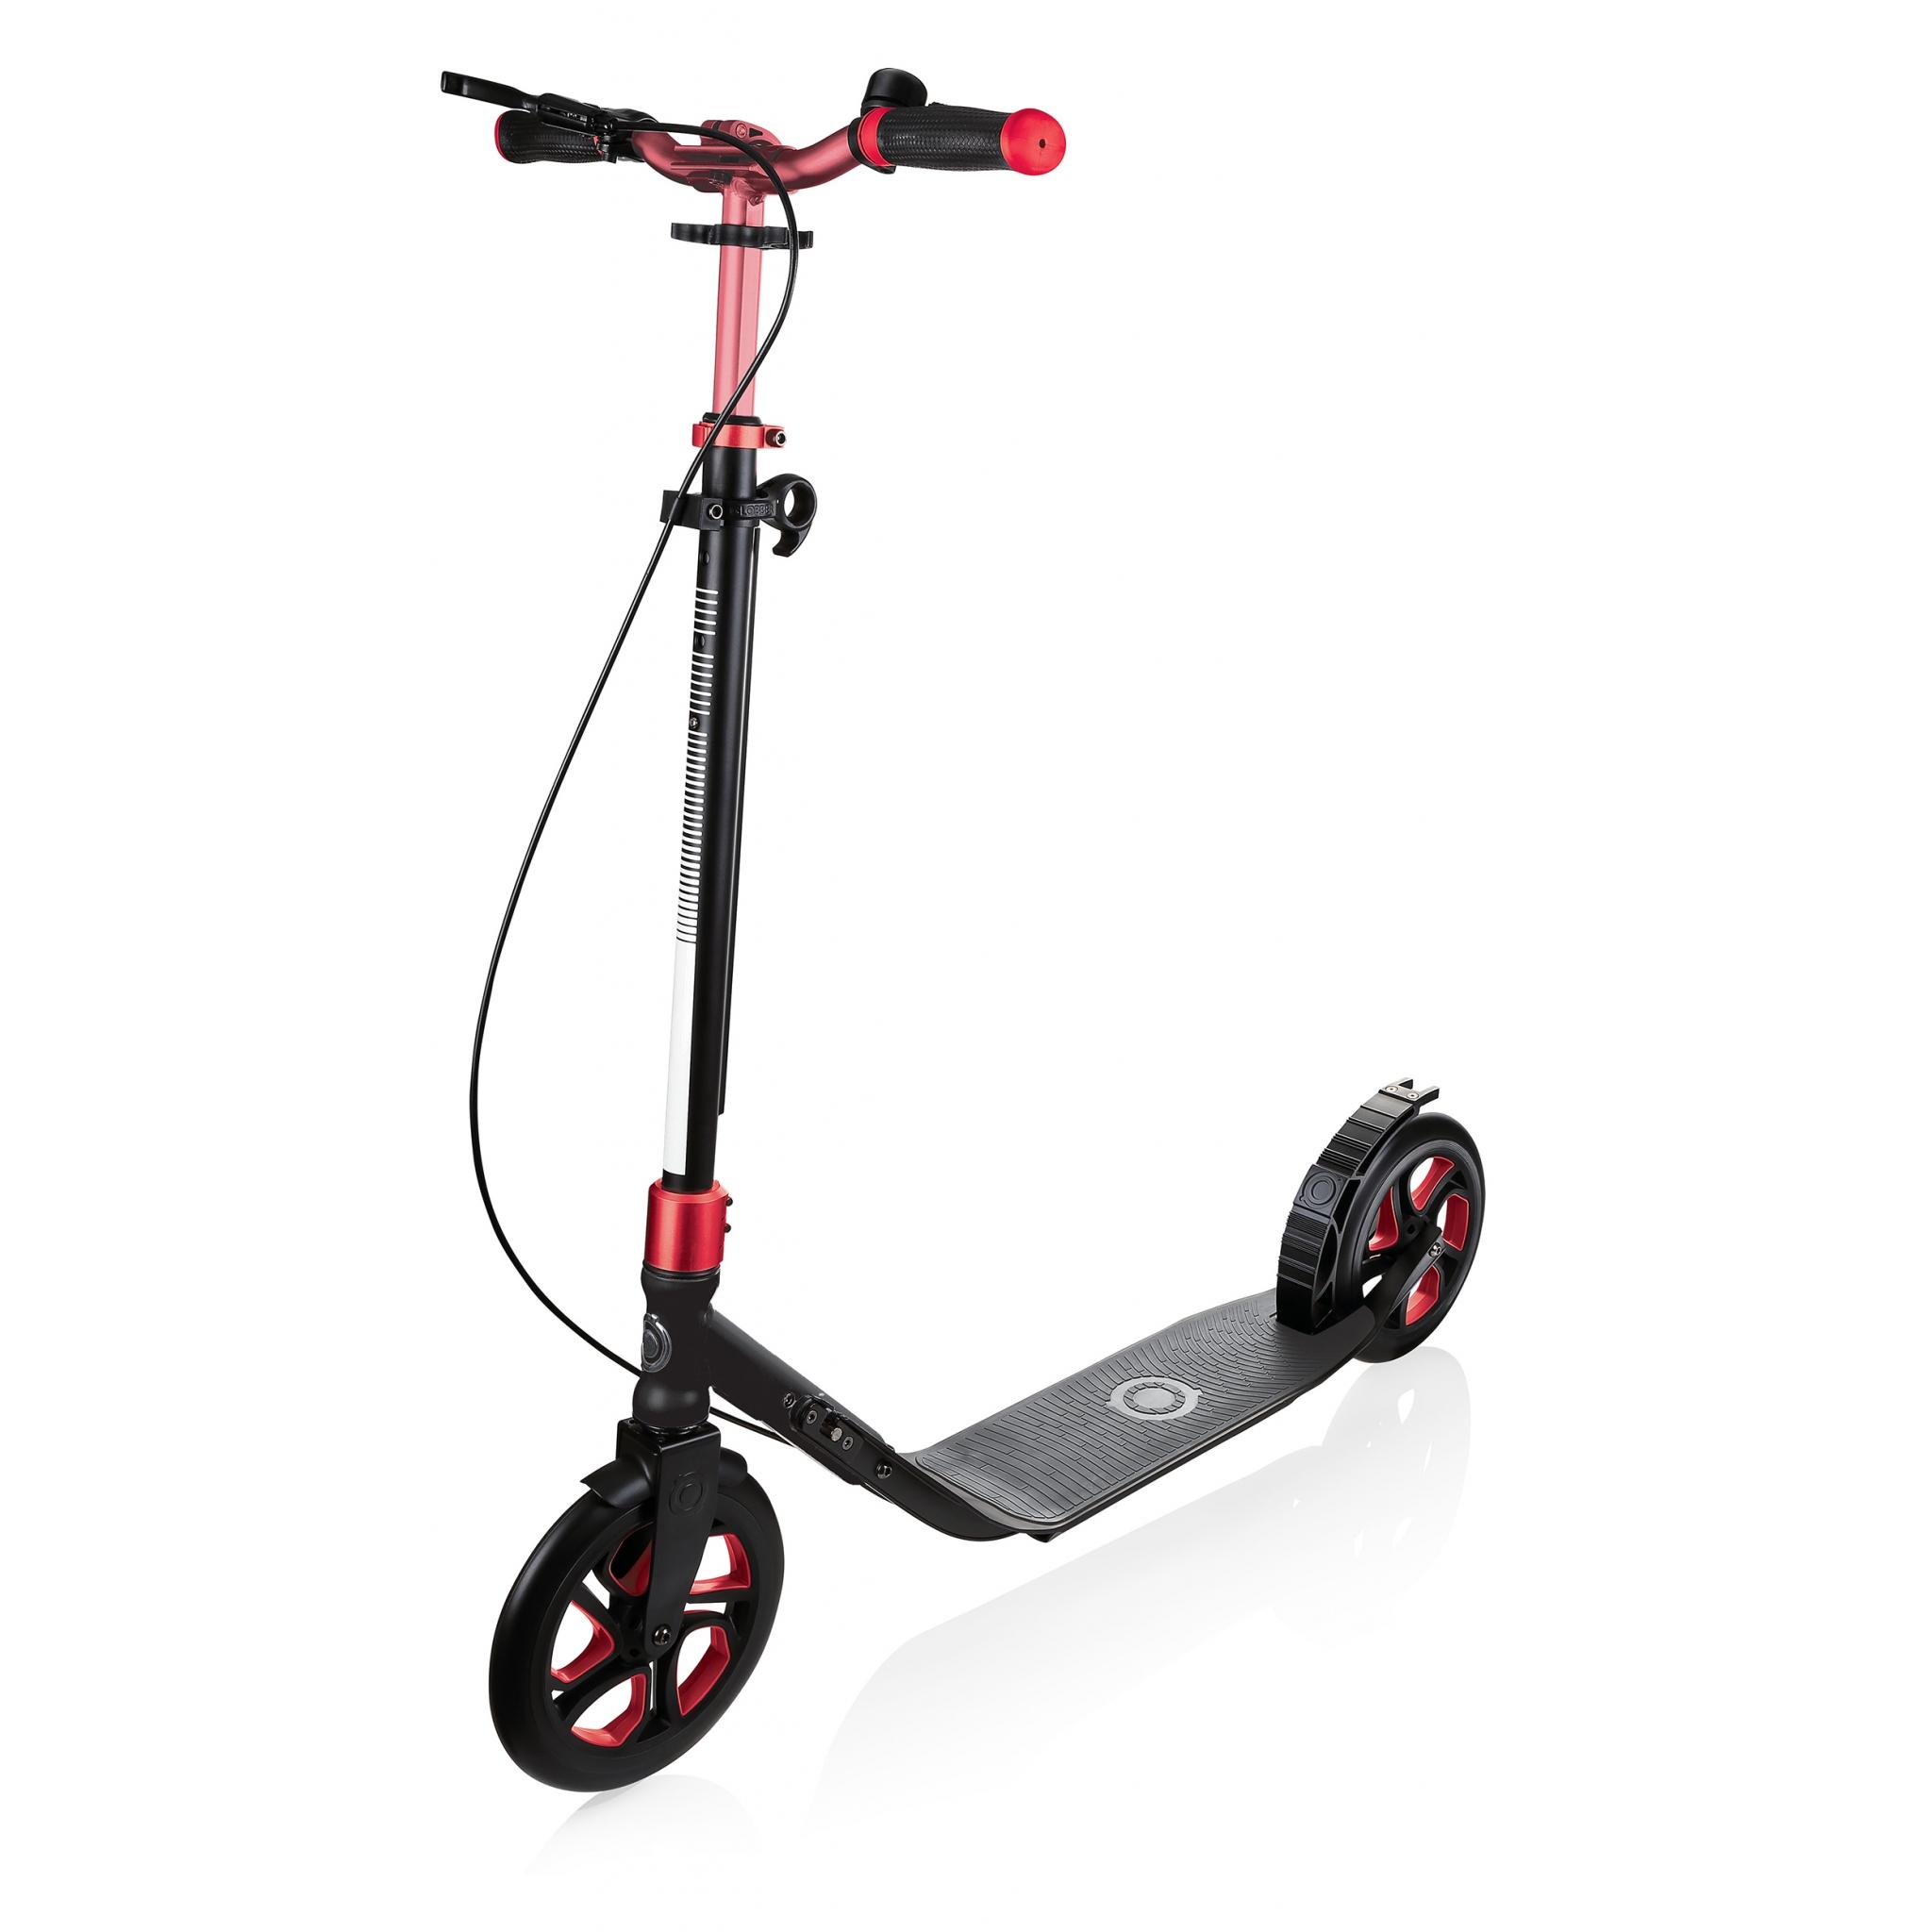 big wheel kick scooter - Globber ONE NL 230 ULTIMATE 0